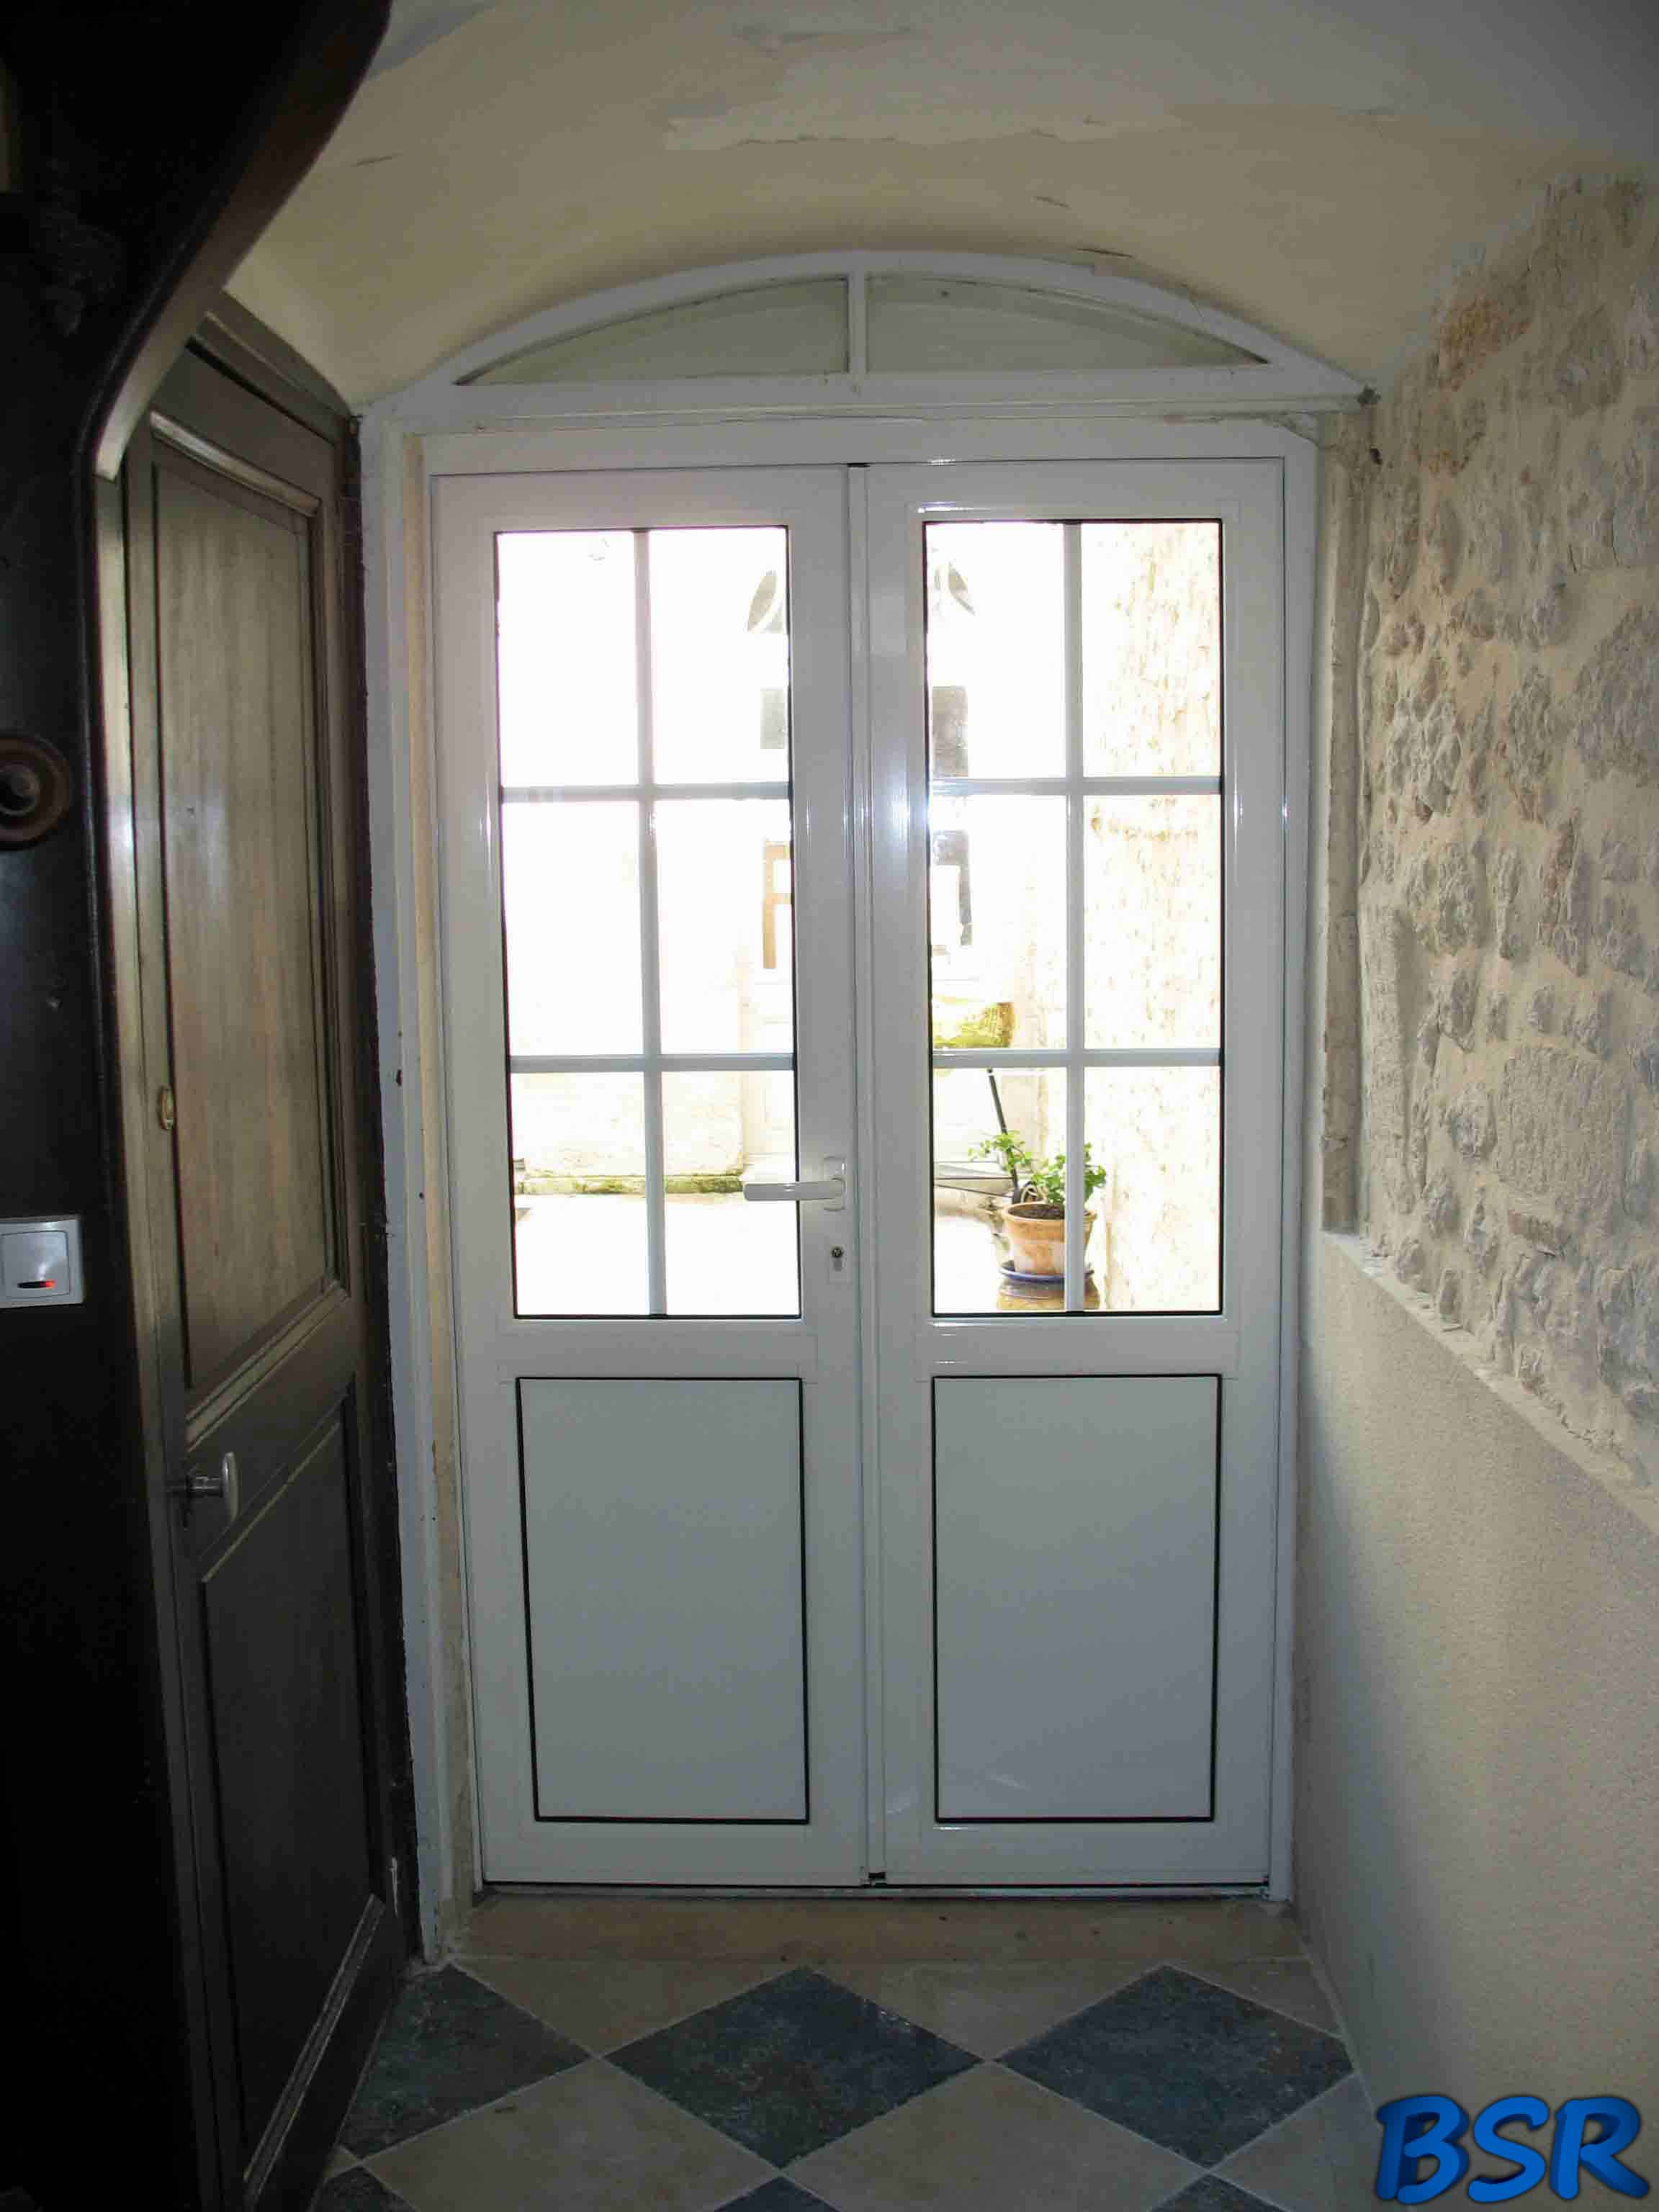 Porte et fenêtre Aluminium BSR 016